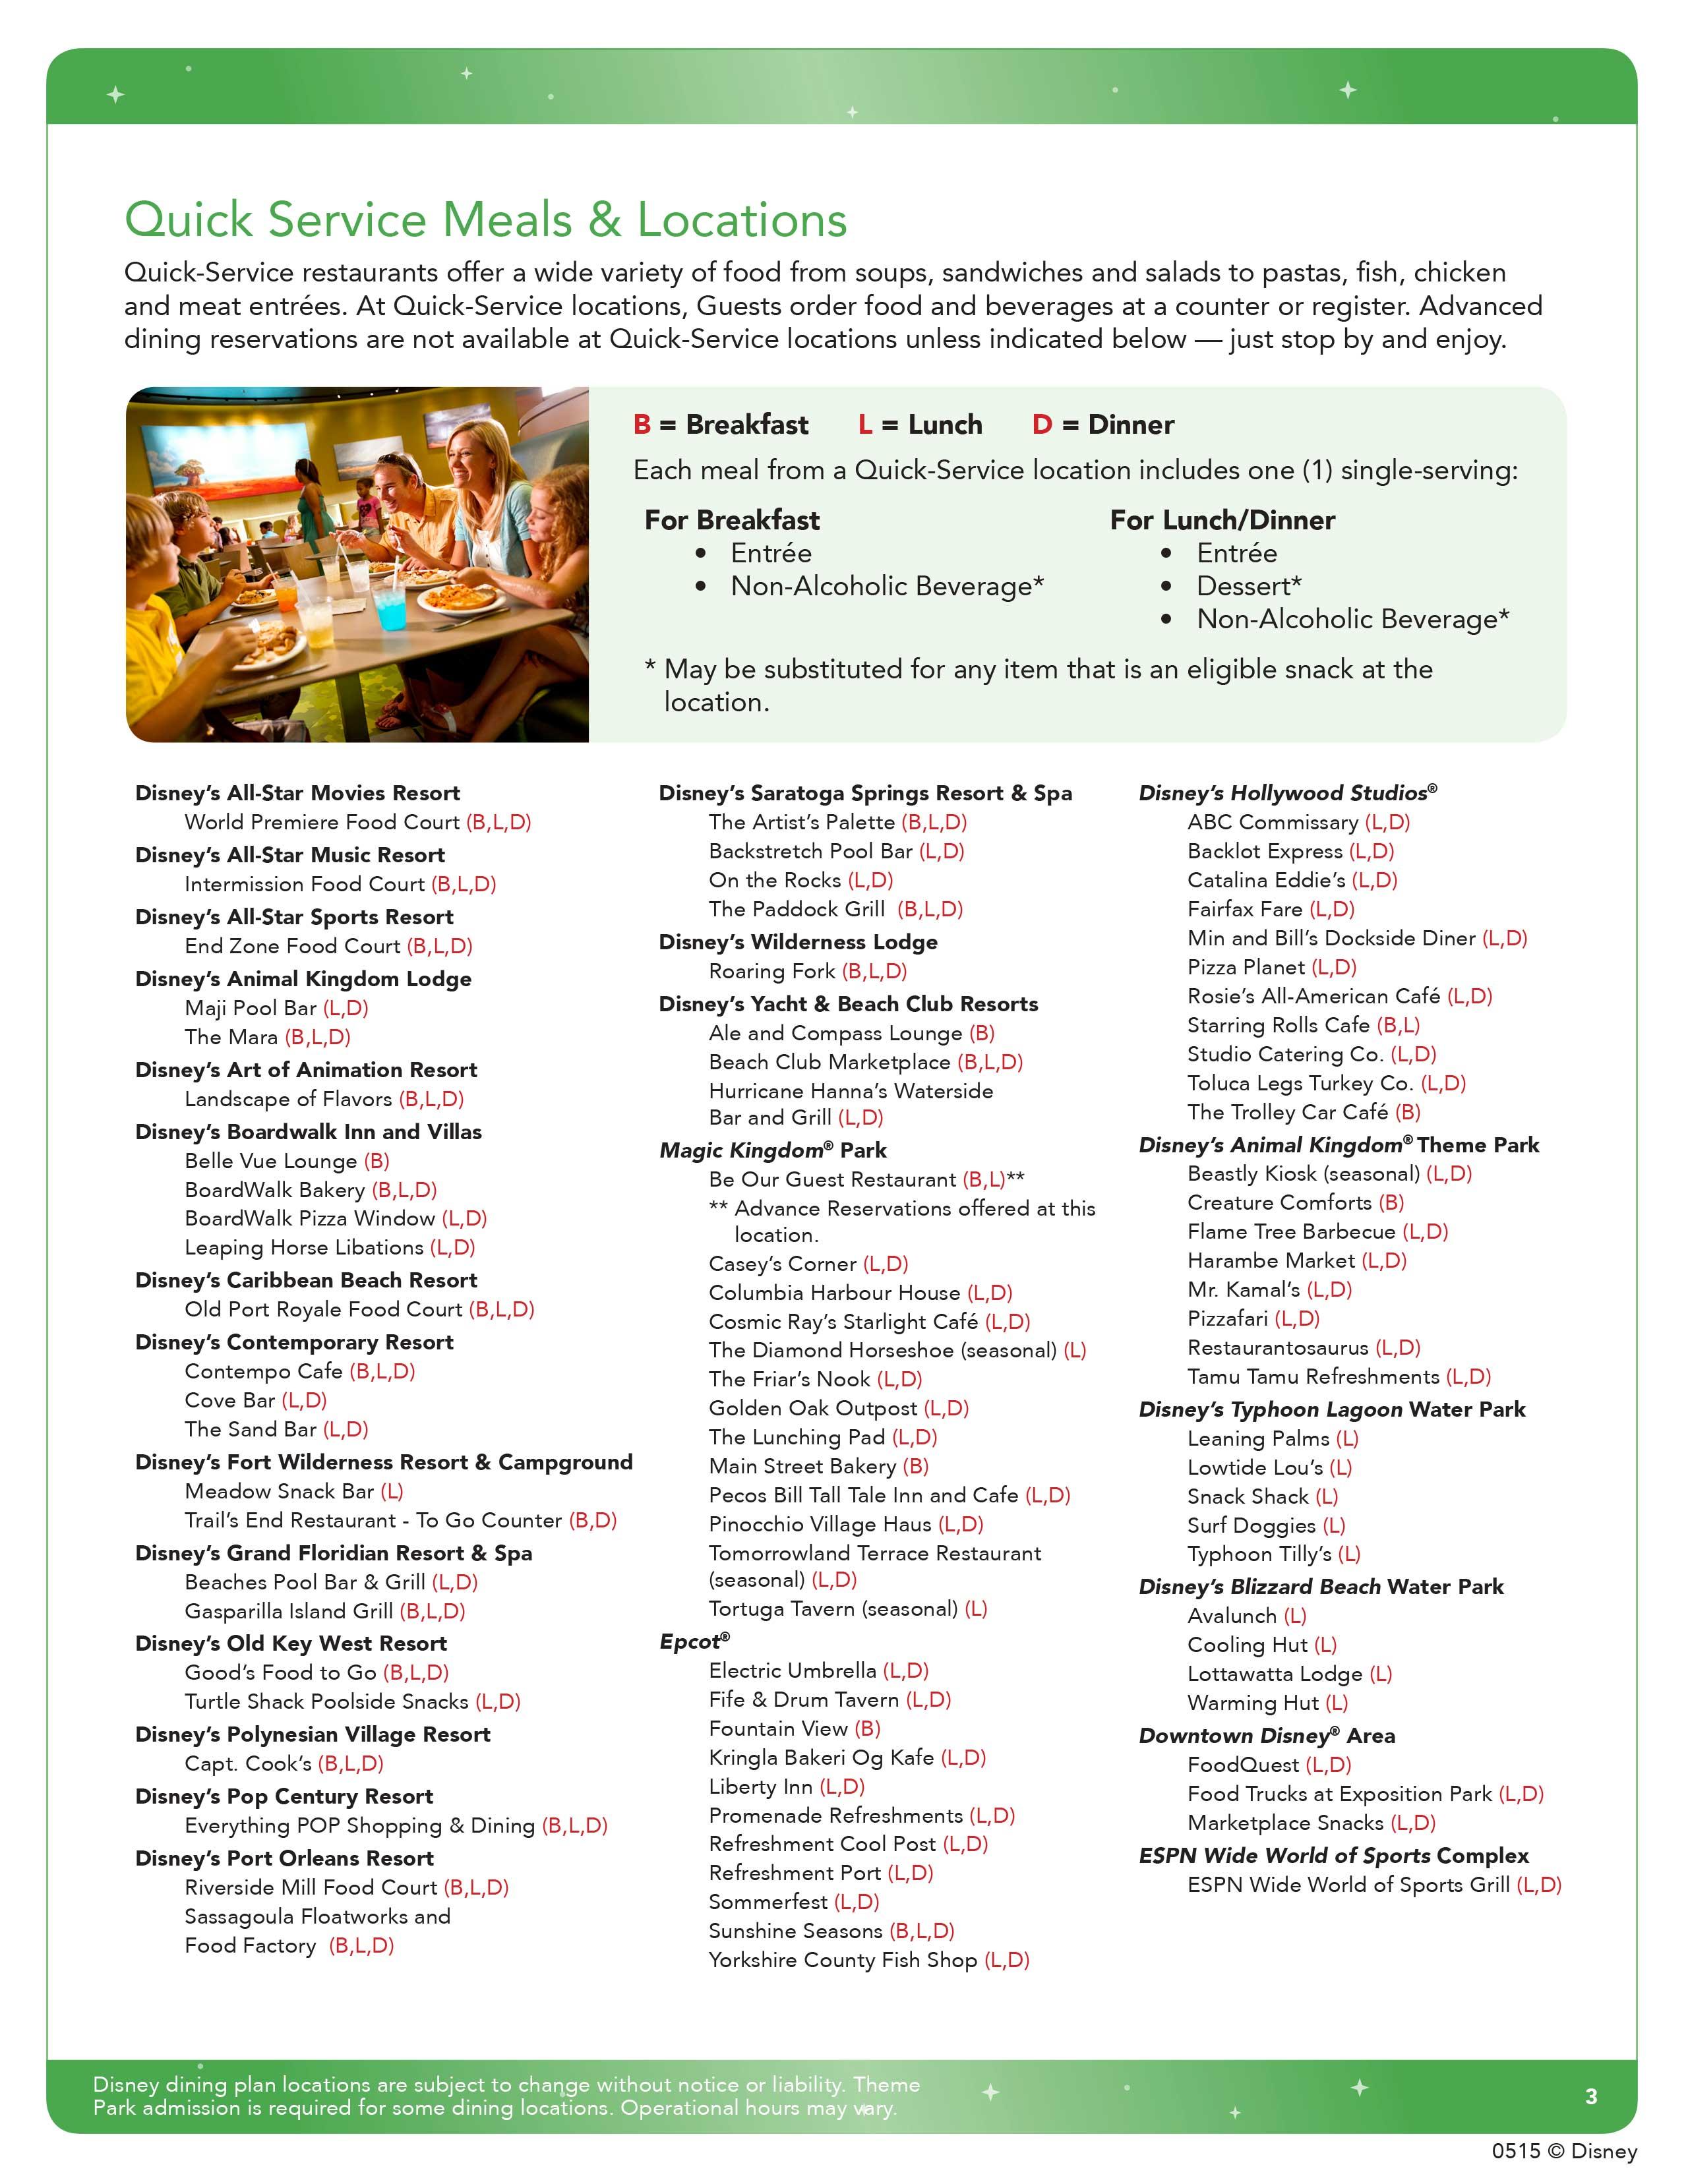 jul 10 2017 2016 disney quick service dining plan brochure page 3